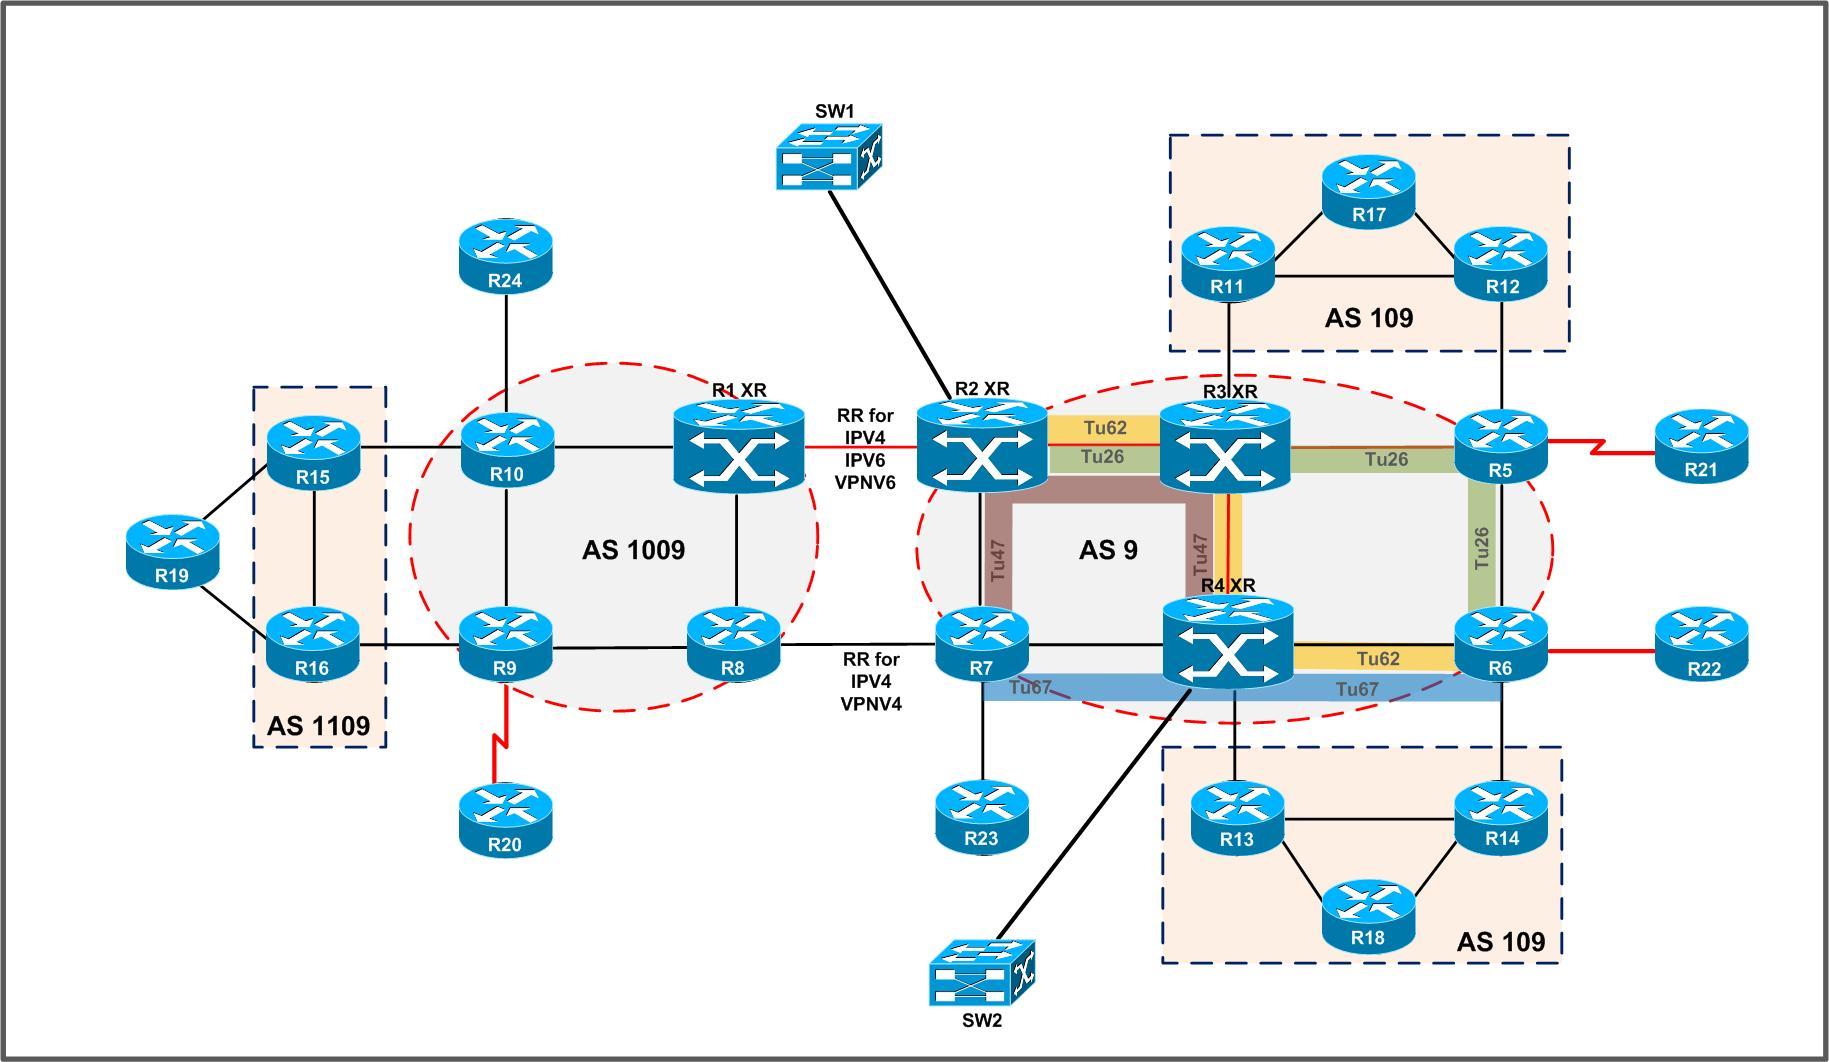 Ccie Data Center Please Consult For Ccie Data Center Lab Exam Prep Rack Rental Or Ccie Lab